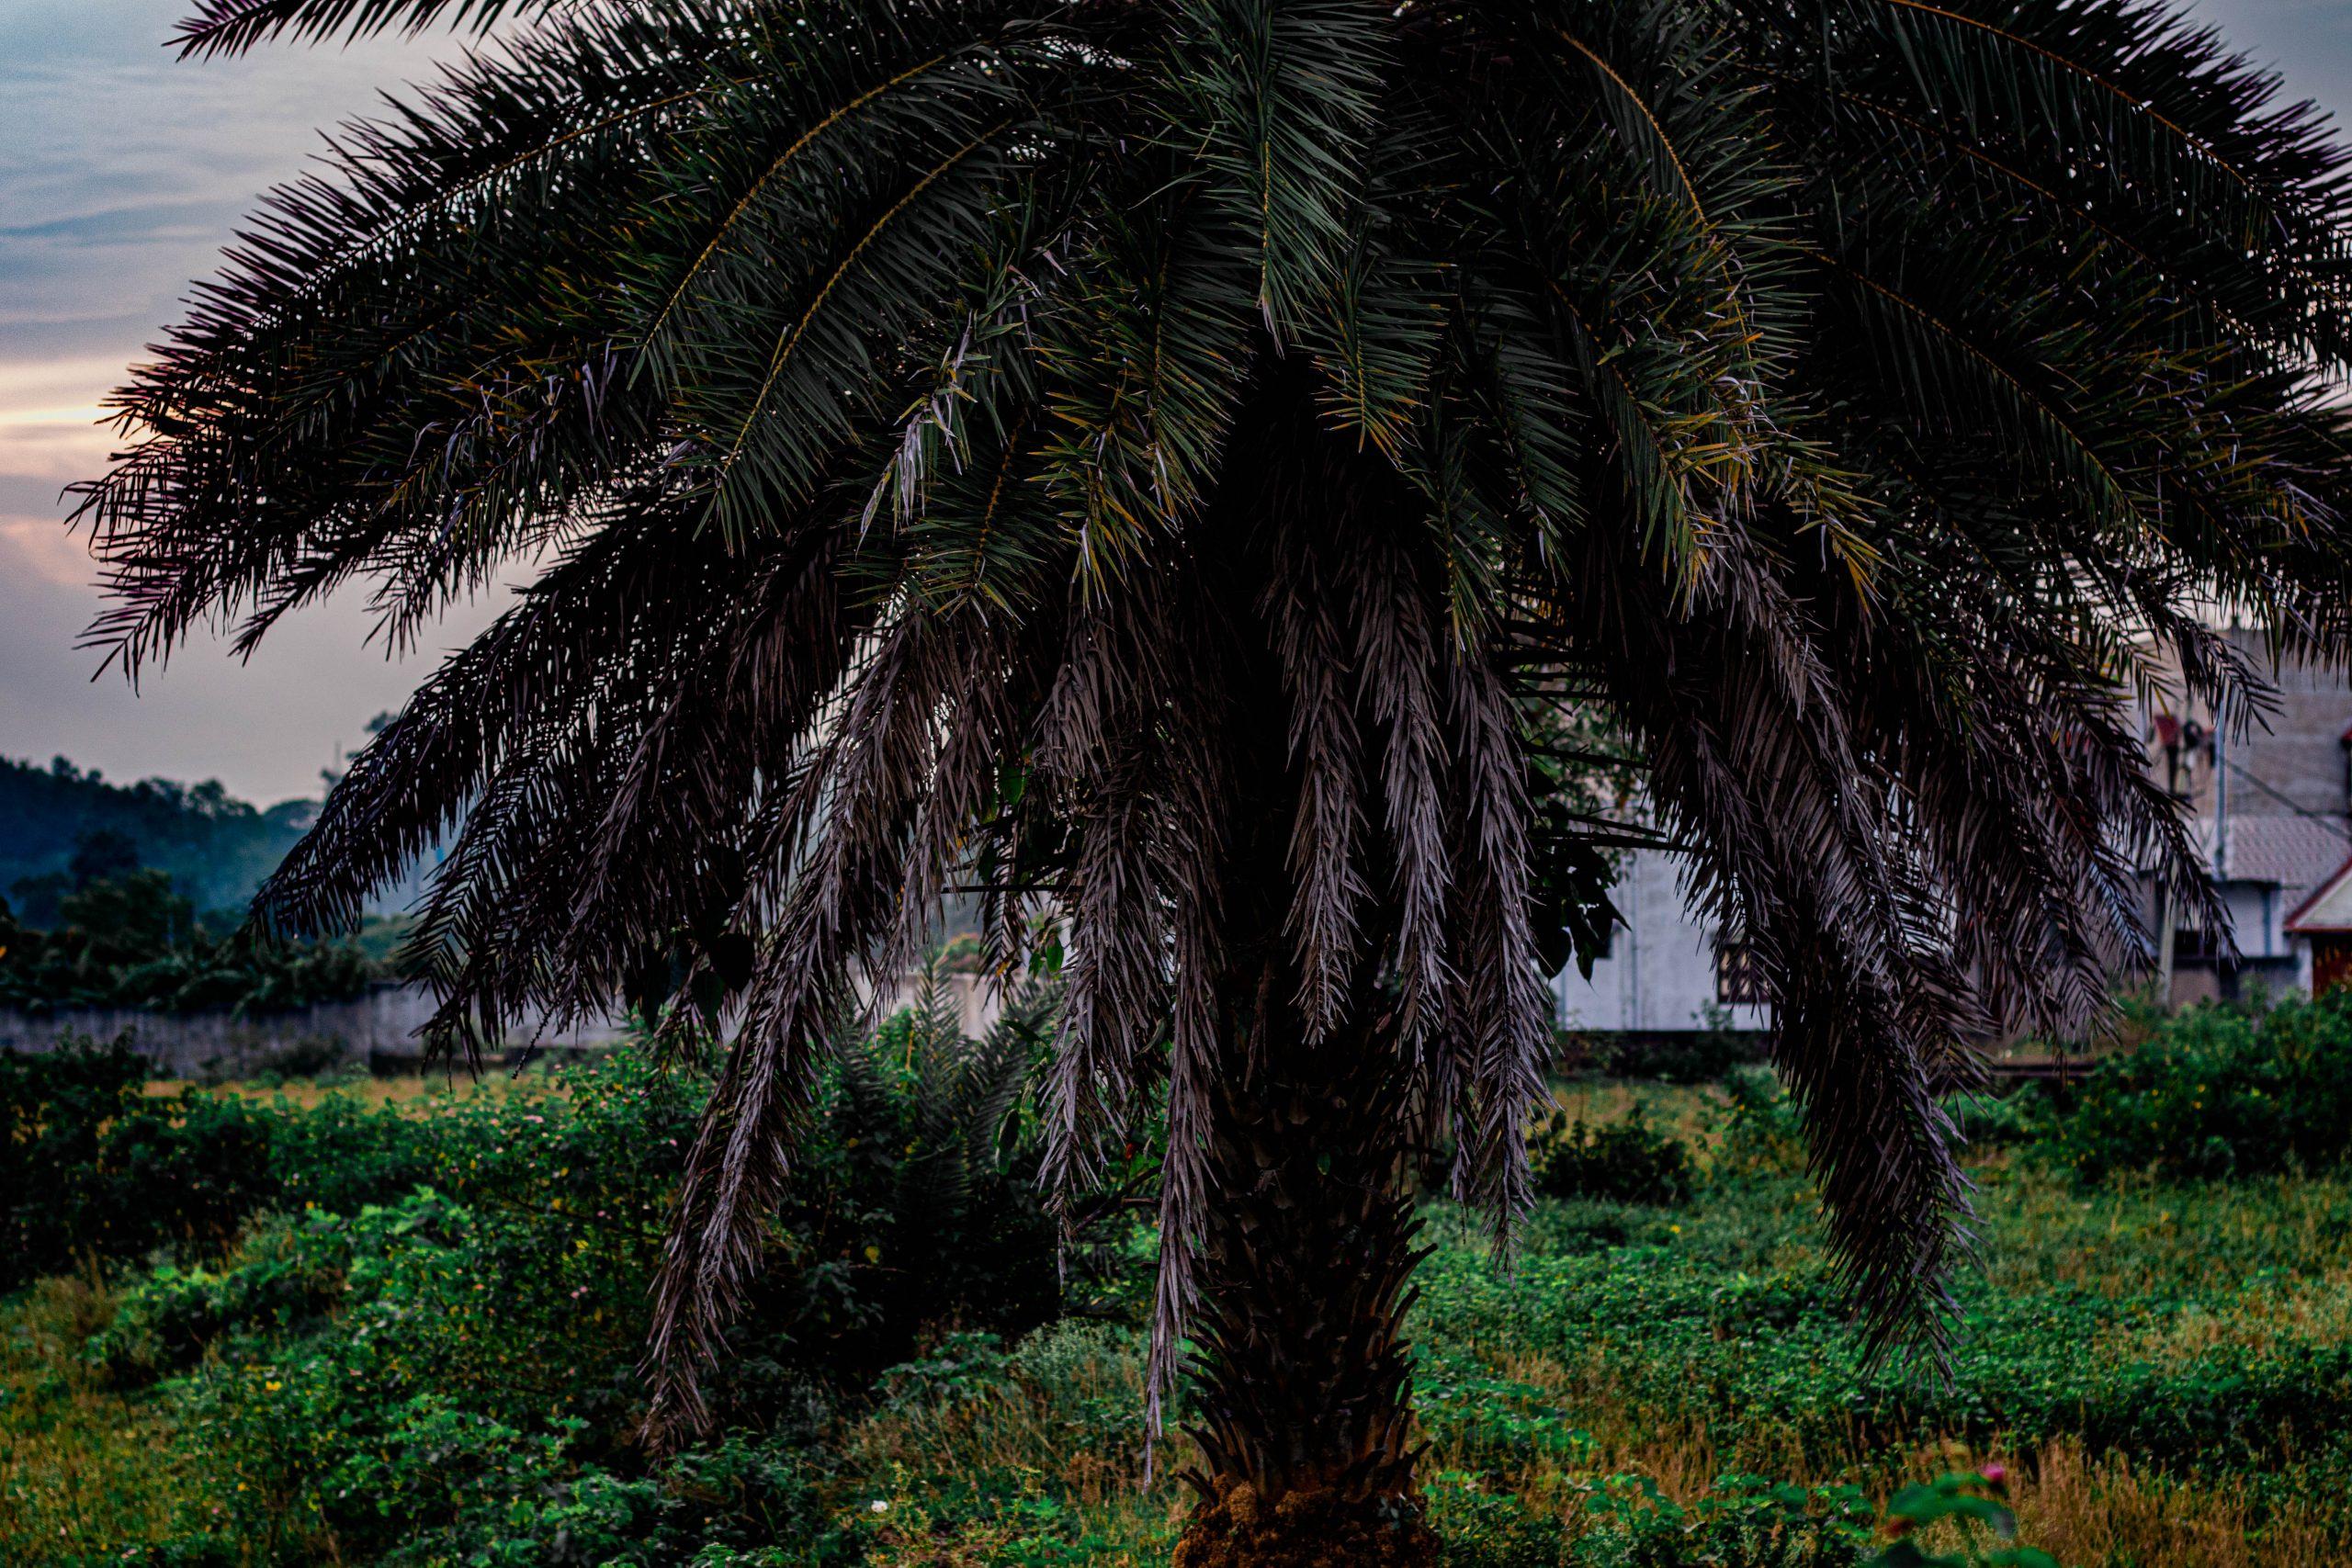 Gorgeous palm tree.